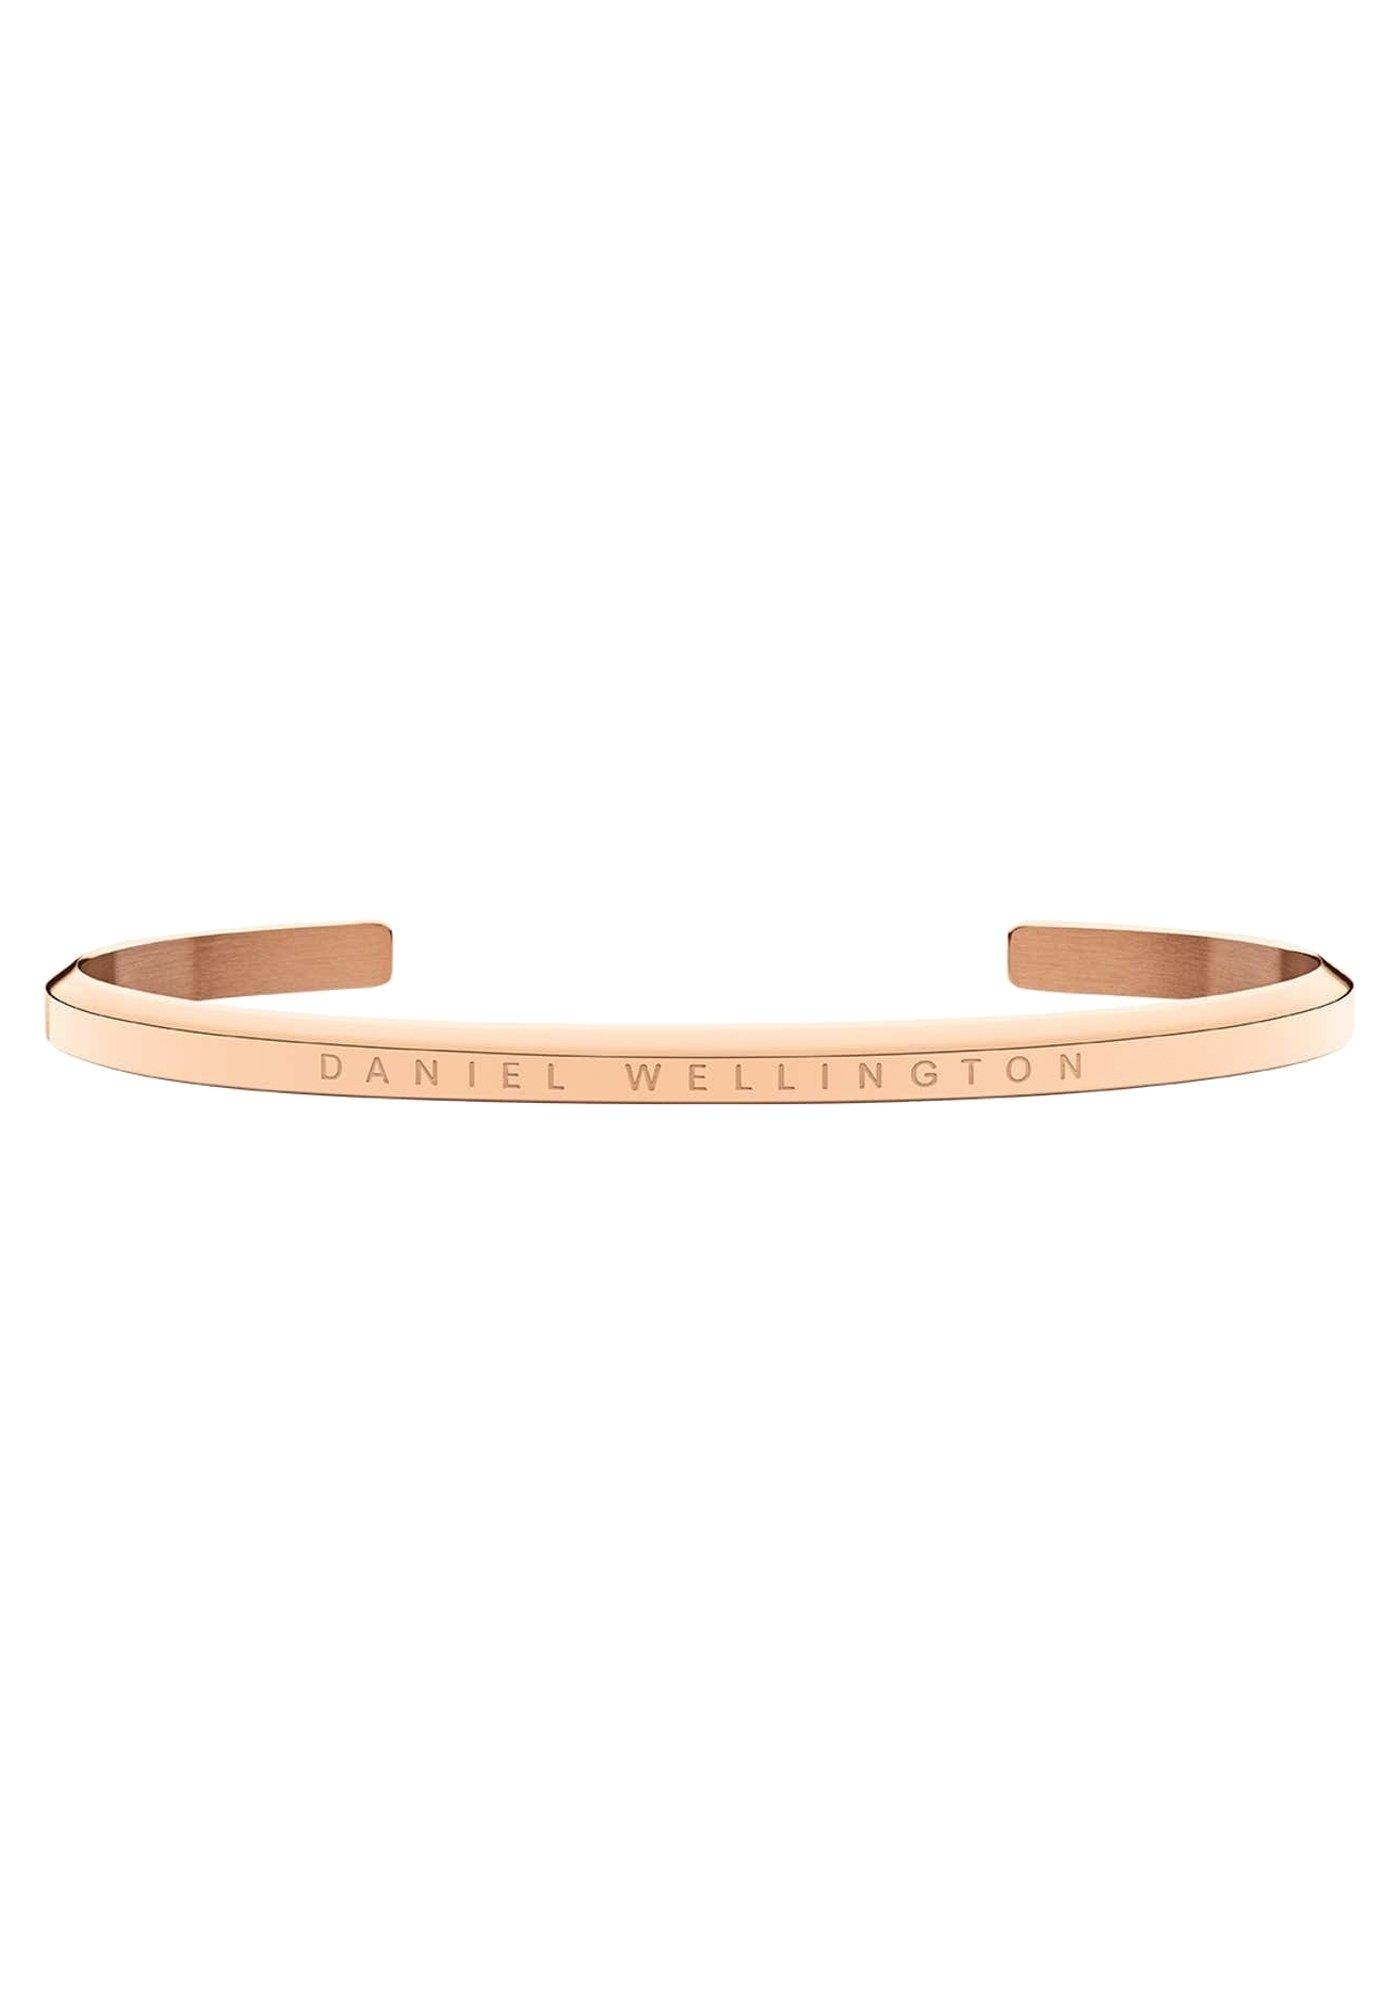 Homme Classic Bracelet – Size Large - Bracelet